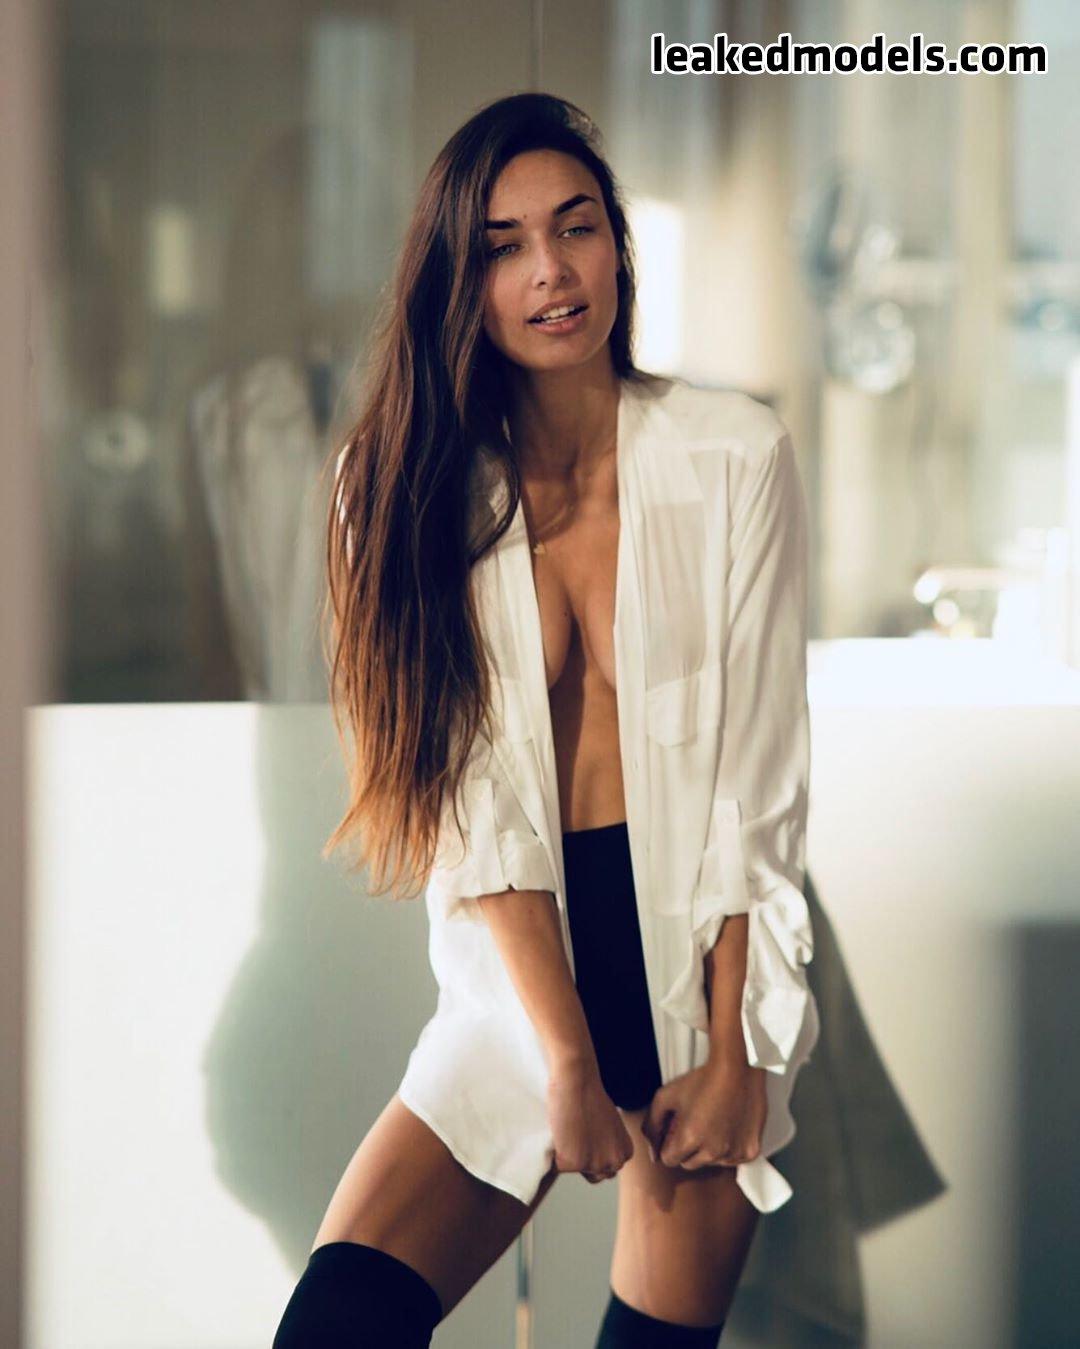 Lee Cherkis Instagram Sexy Leaks (9 Photos)